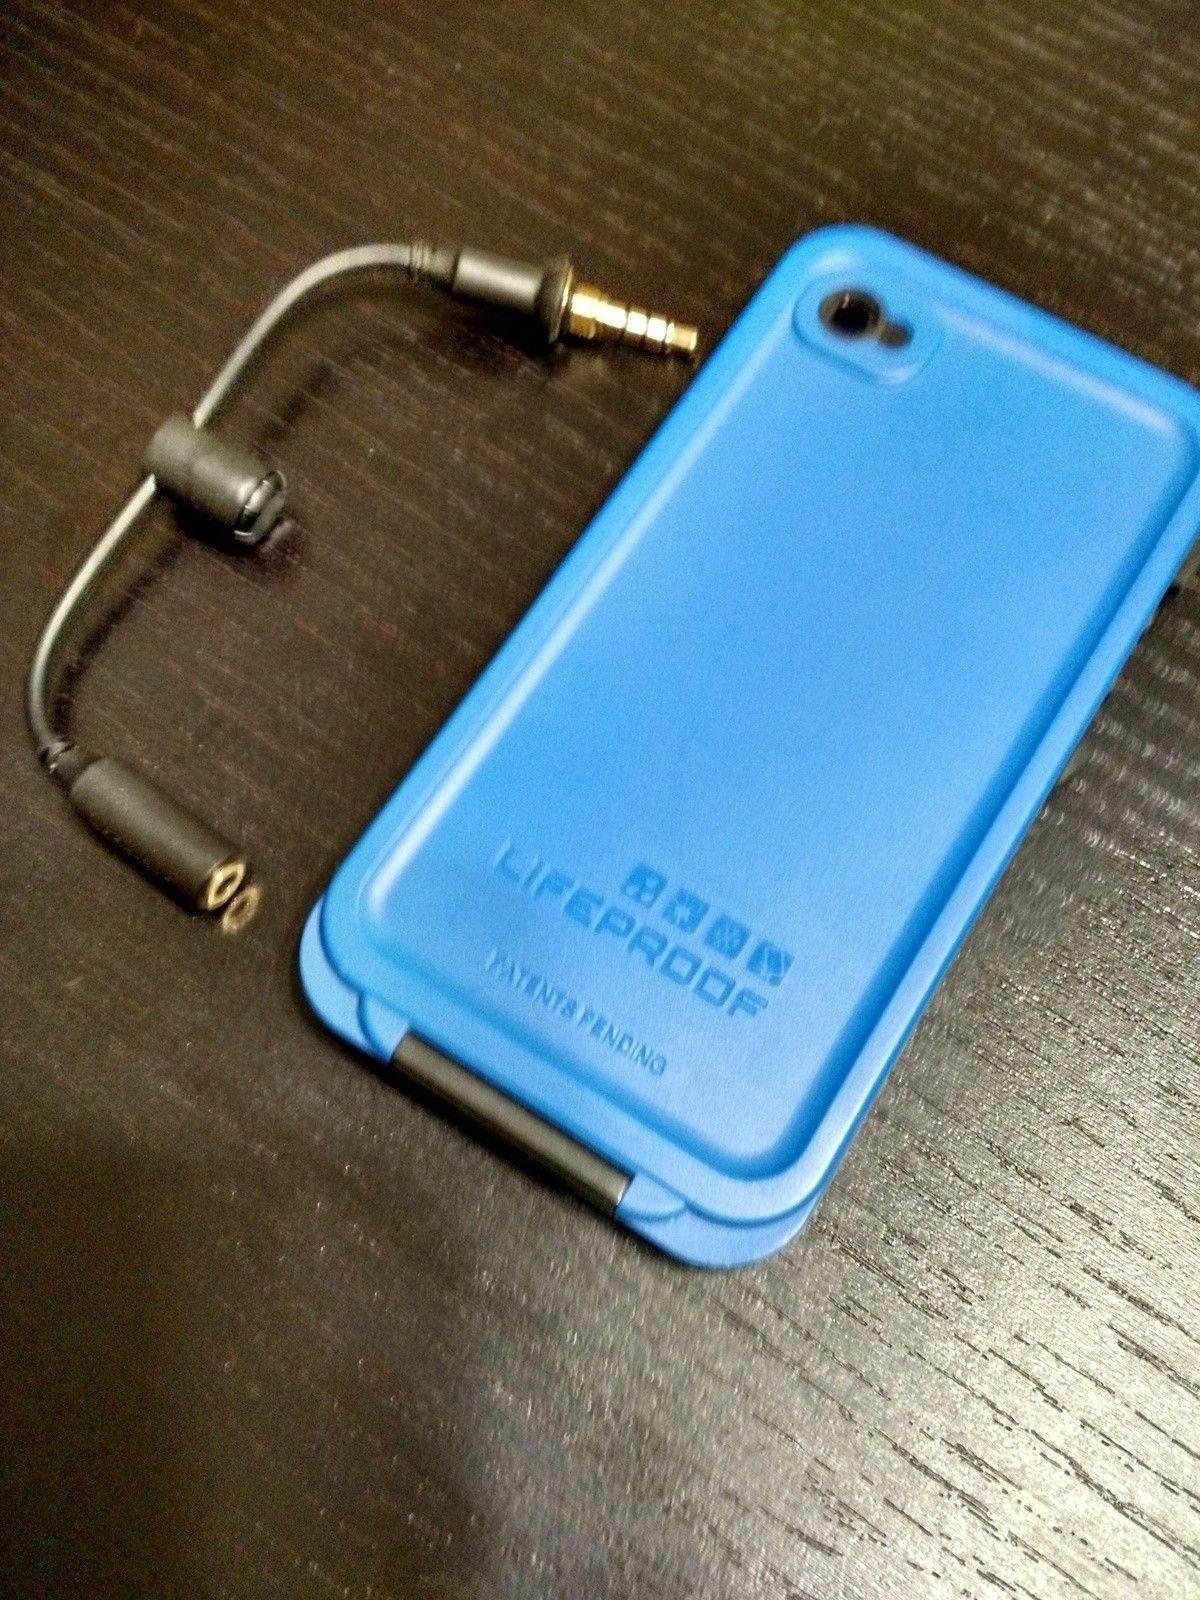 Oakley watch soft case and 2 iphone 4/4s case - uploadfromtaptalk1416110451278.jpg